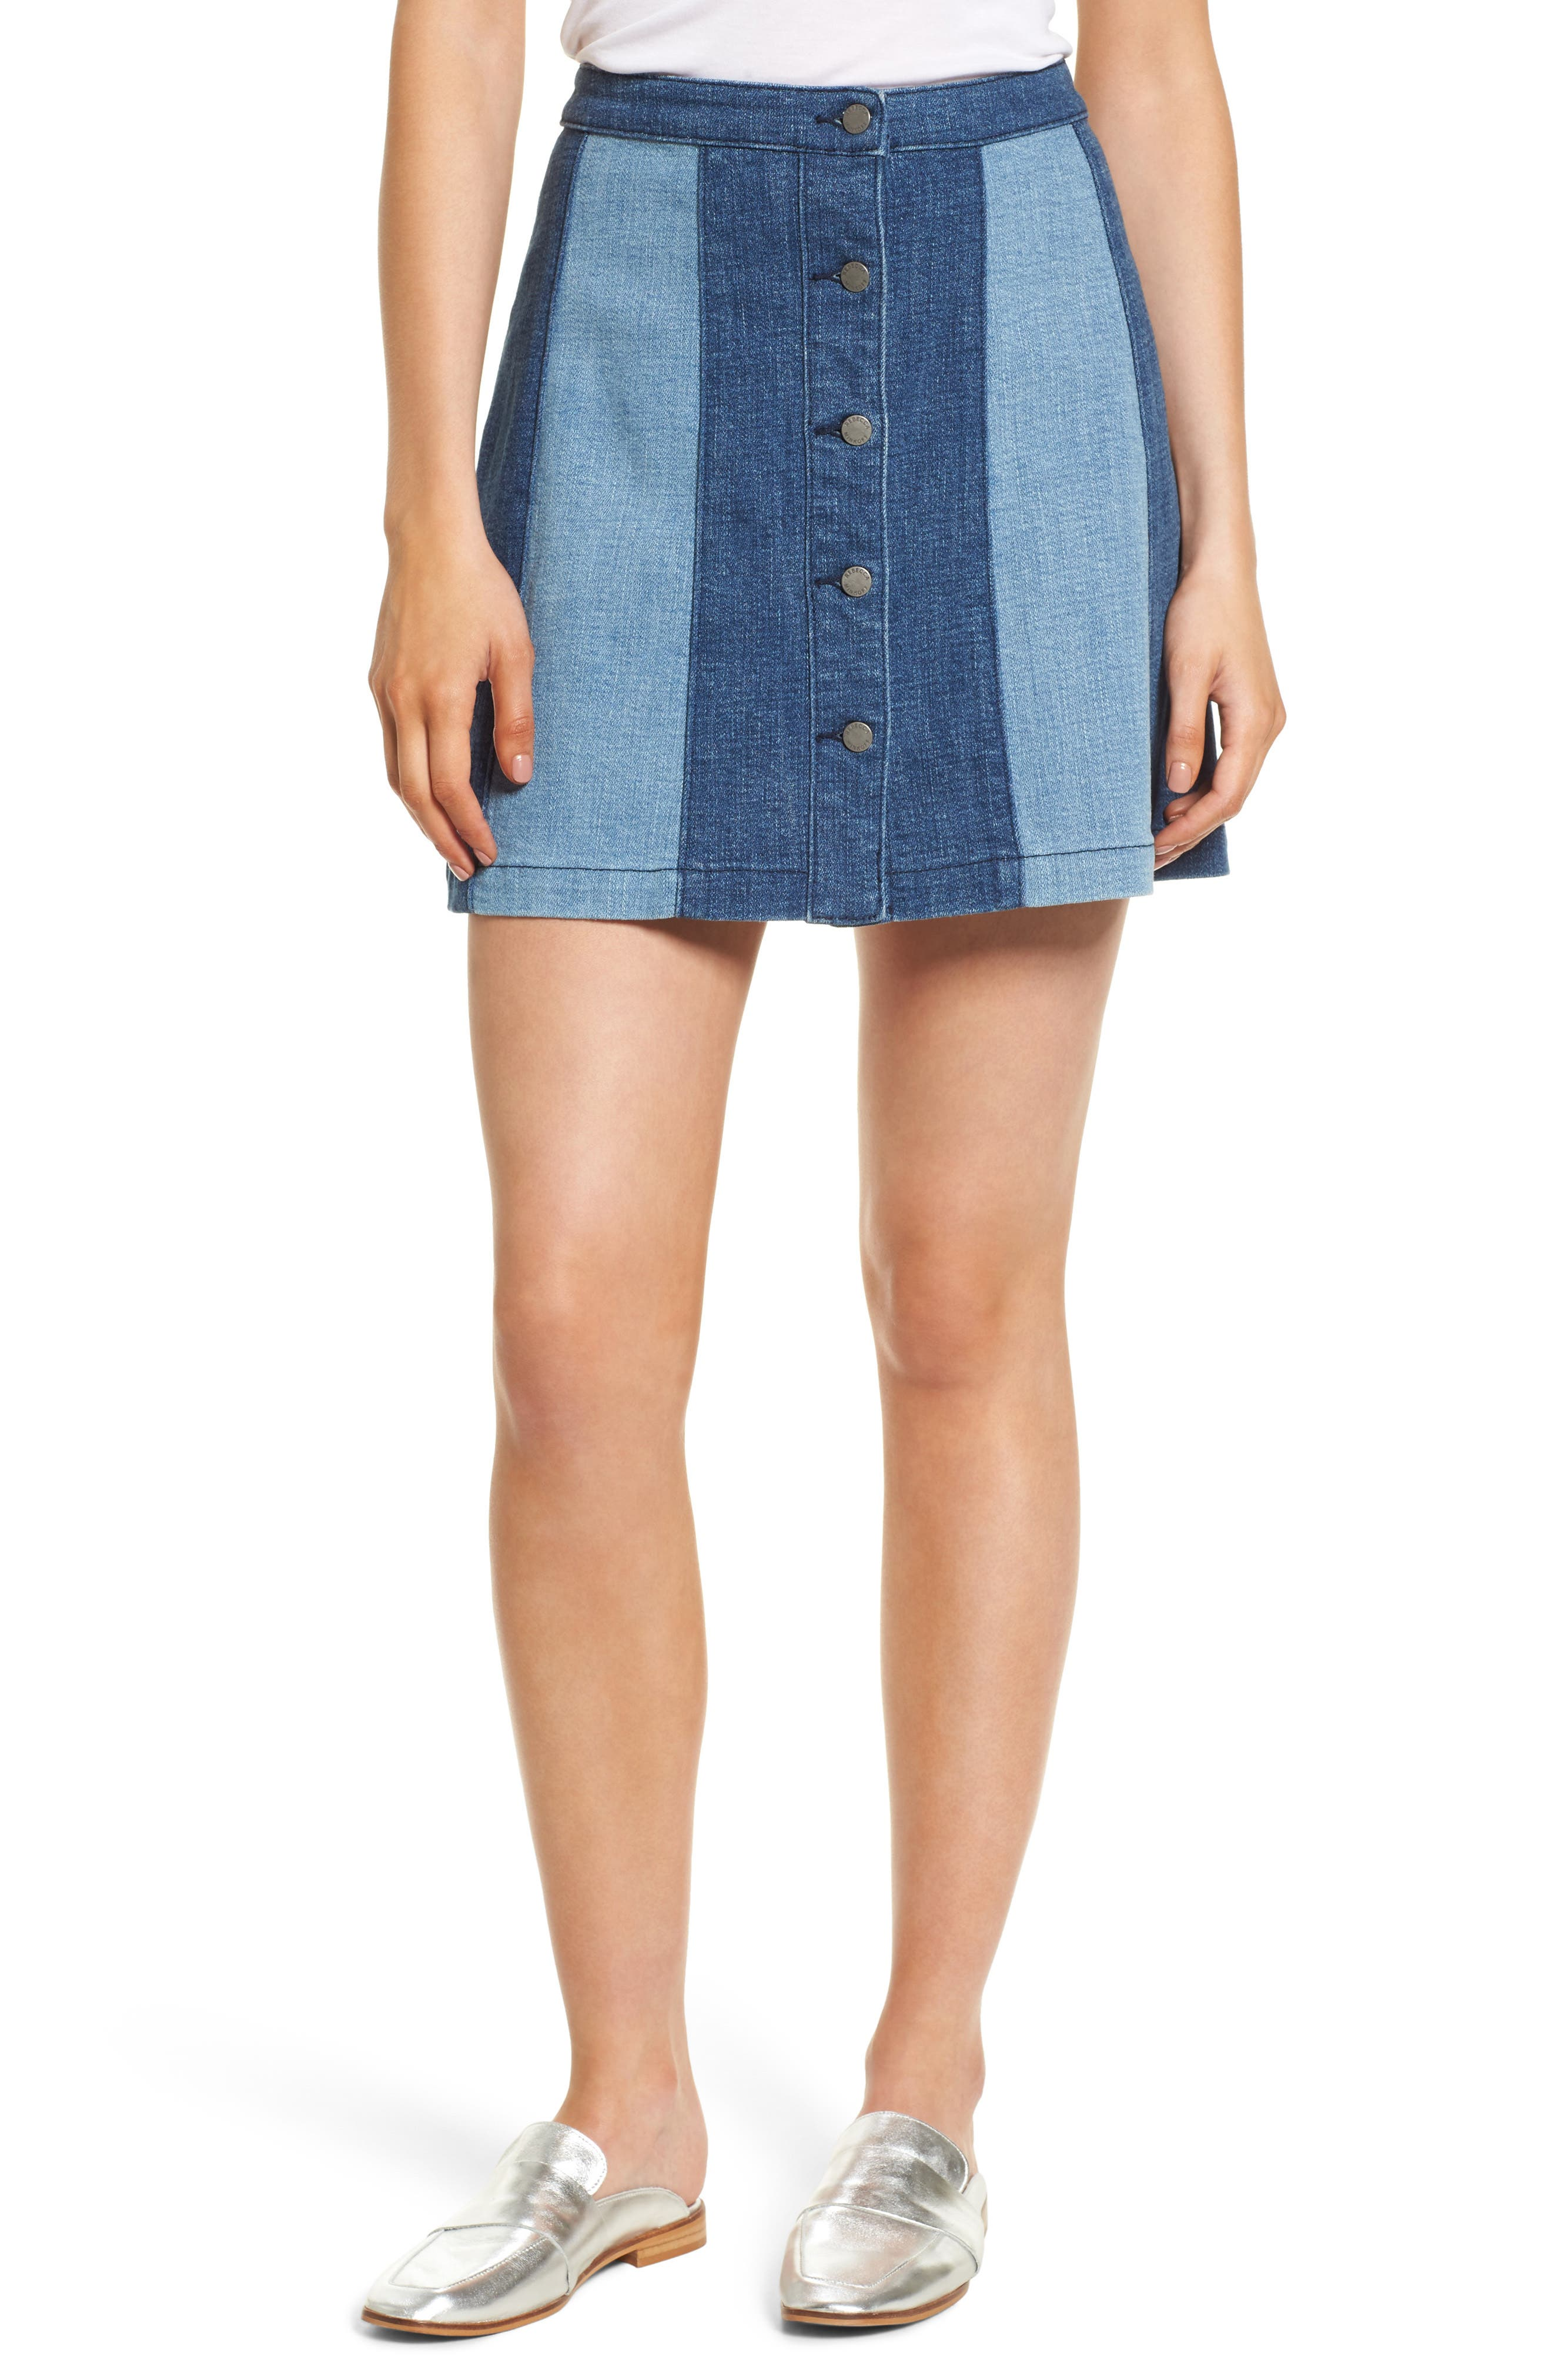 Beatty Denim Miniskirt,                             Main thumbnail 1, color,                             Indigo